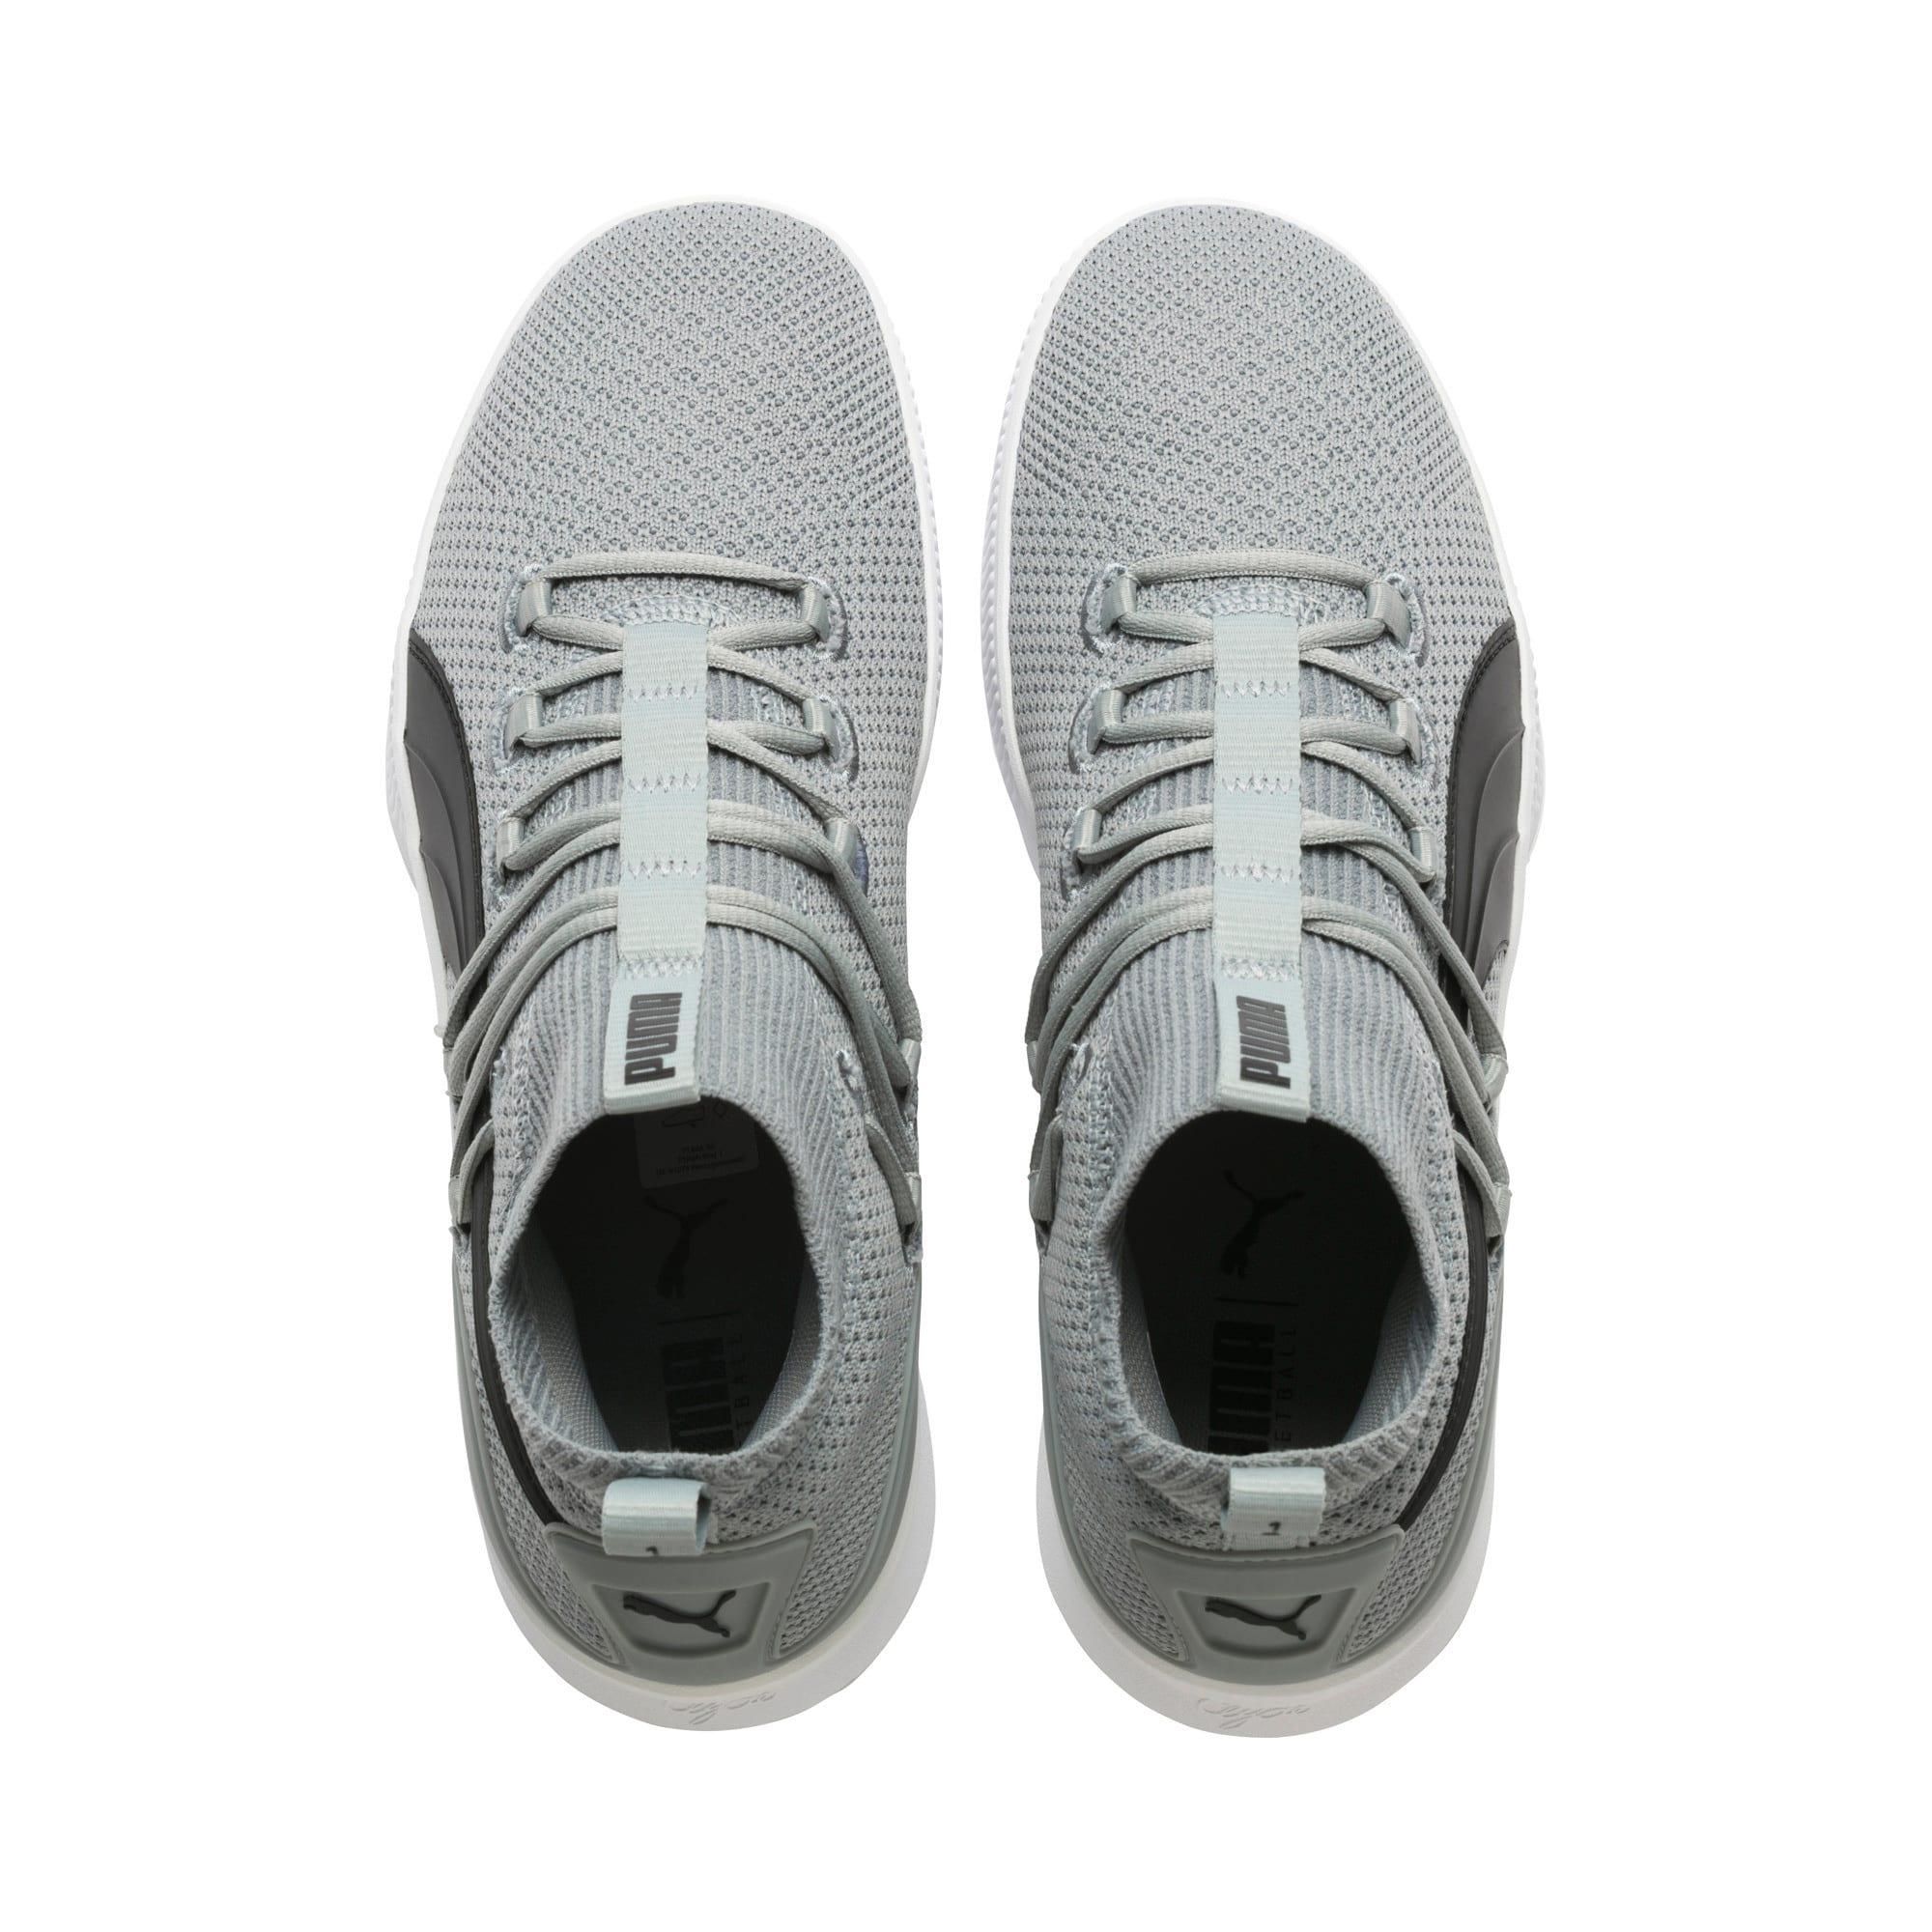 Thumbnail 6 of Clyde Court Core Basketball Shoes, Quarry-Puma Black, medium